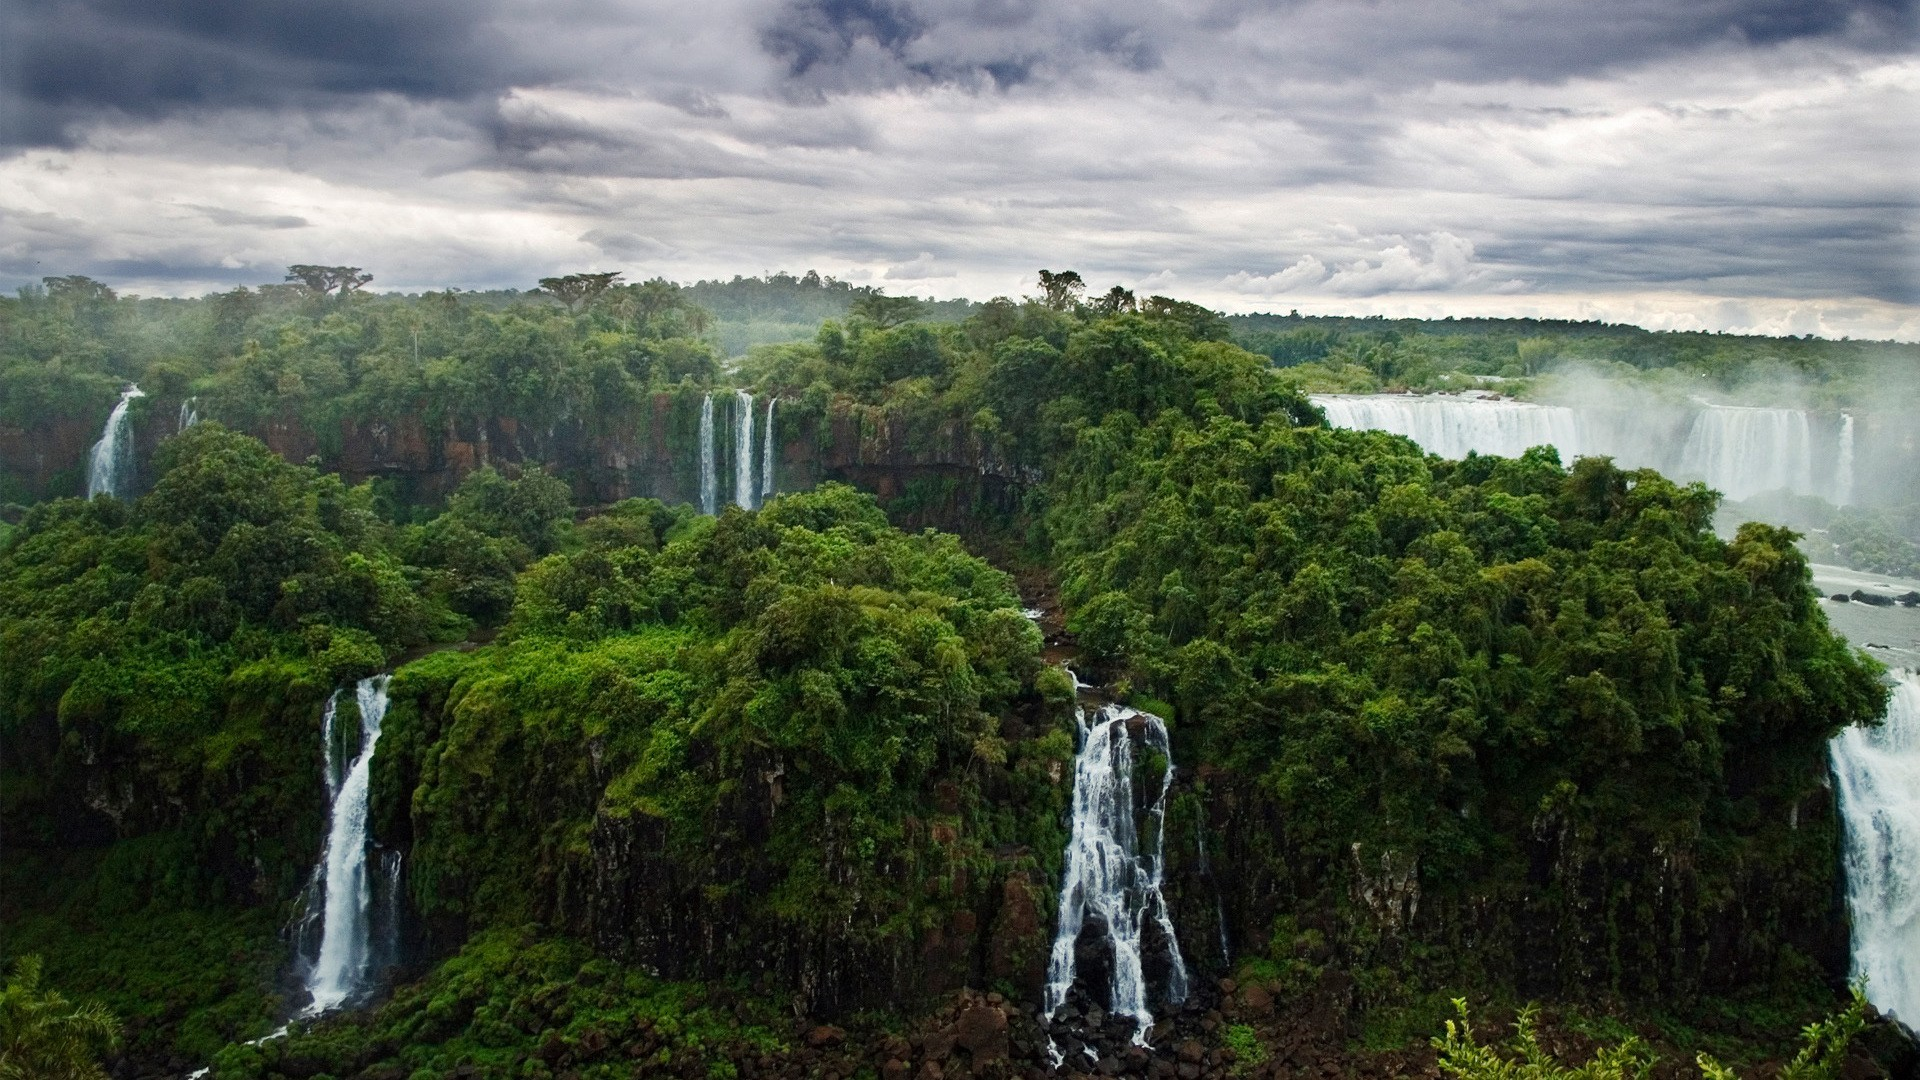 Free 1080p Nature Wallpaper Hd Wallpapers Background - Iguazu Falls - HD Wallpaper